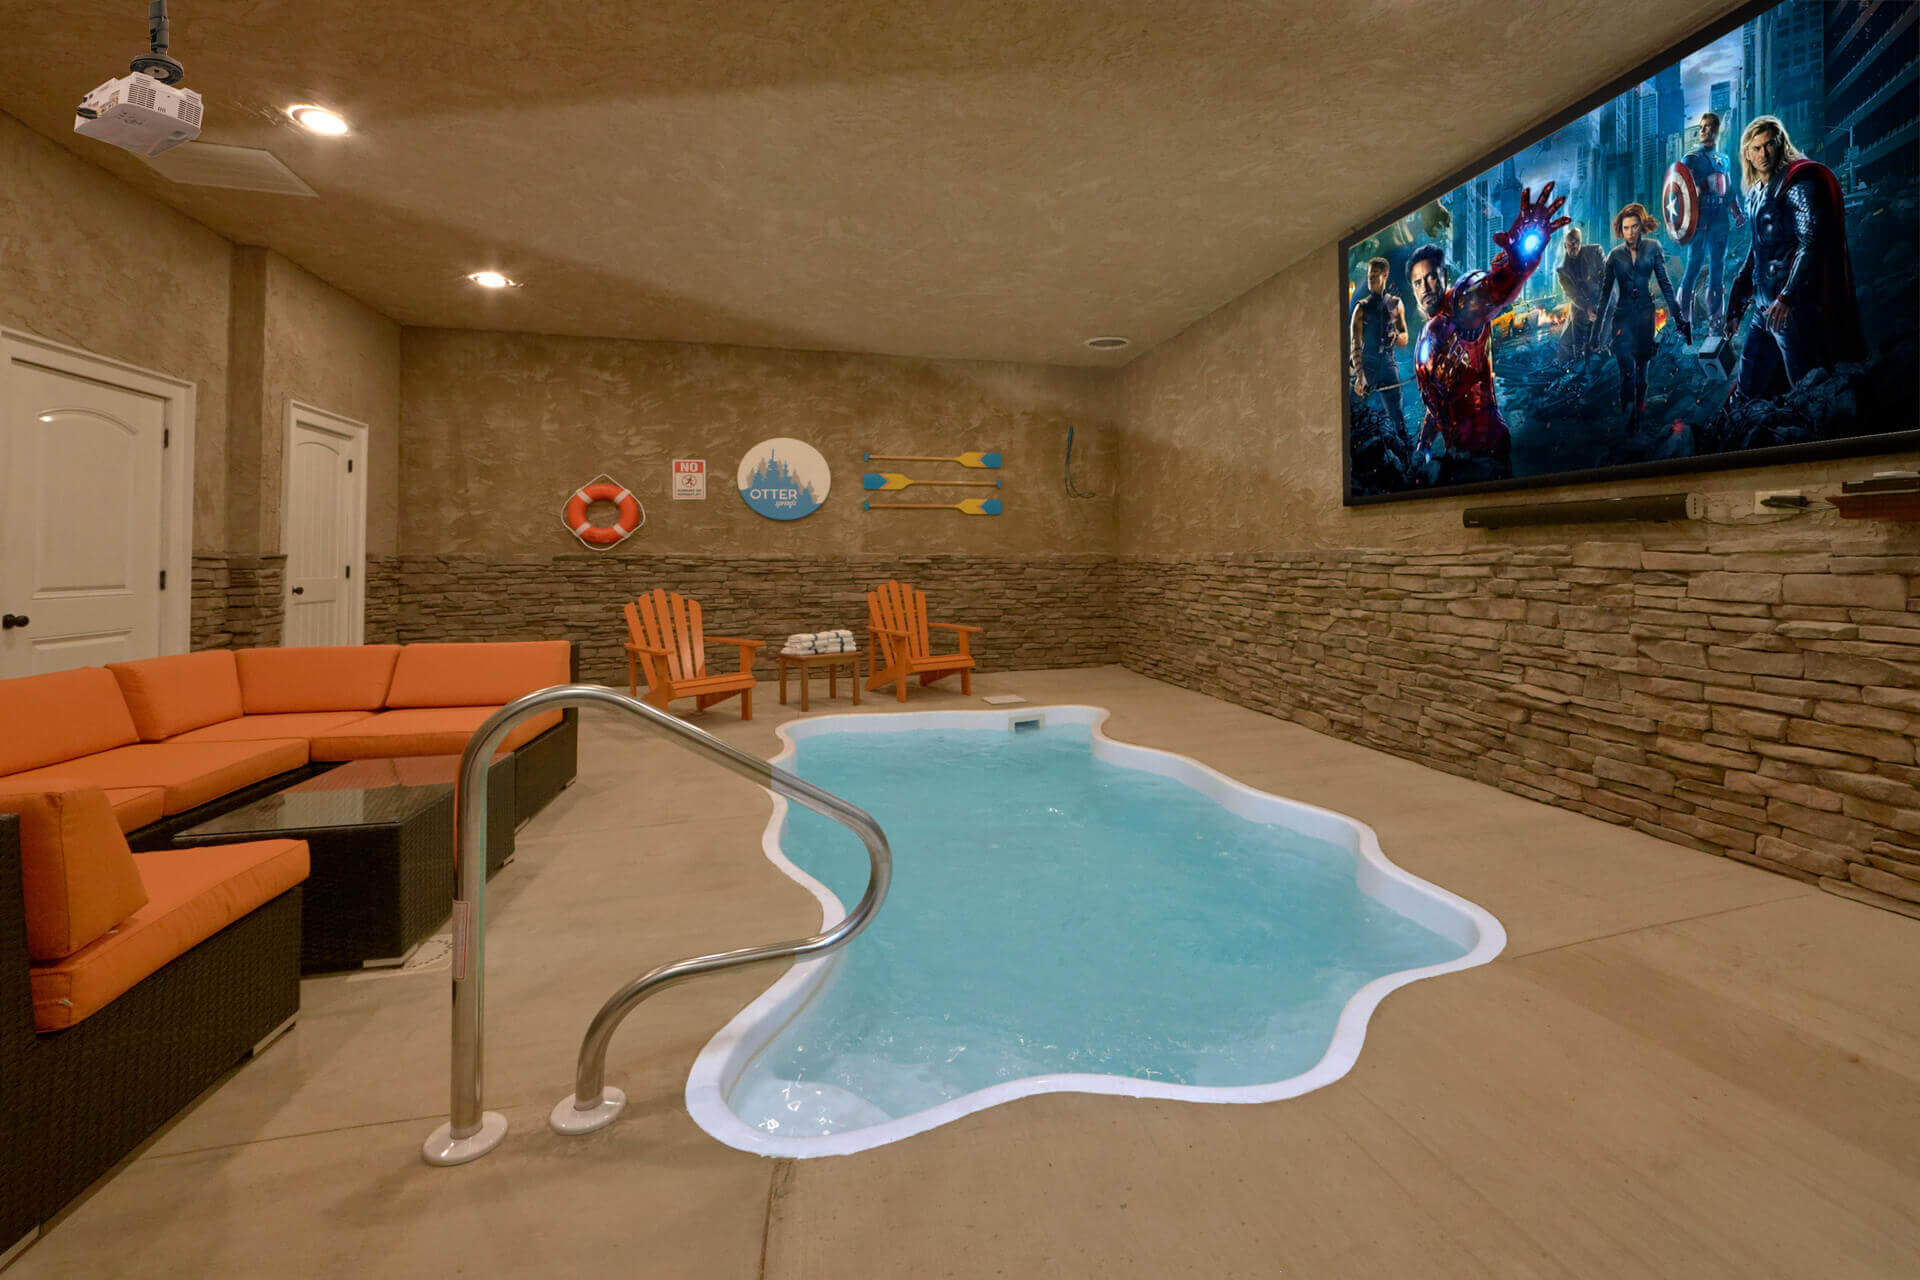 Tremendous Gatlinburg Cabins With Indoor Pools For Rent Elk Springs Interior Design Ideas Gentotthenellocom